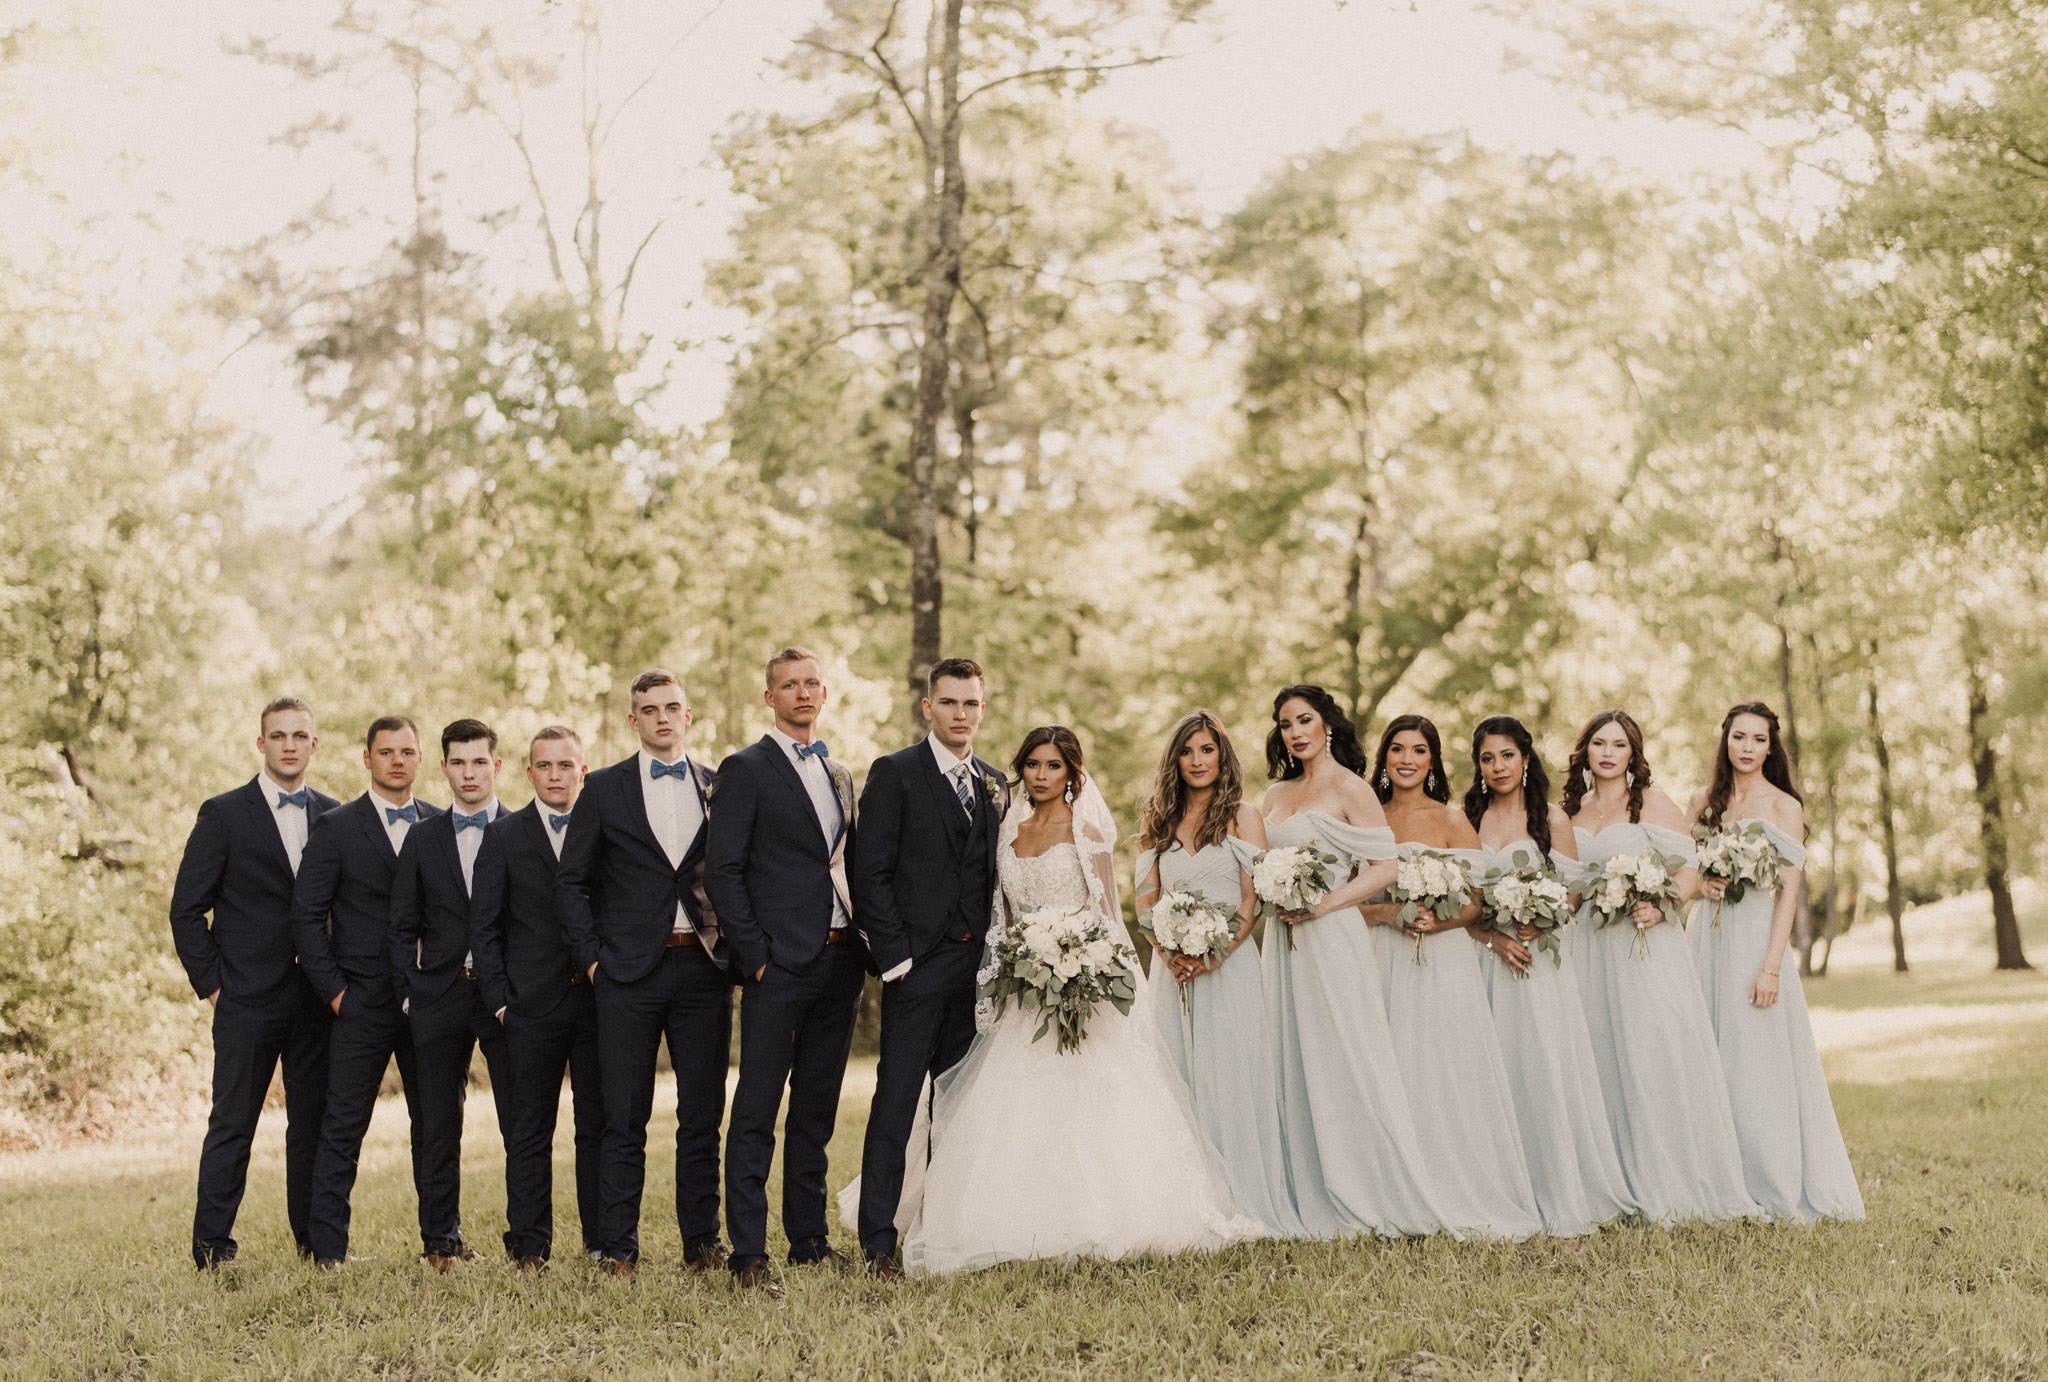 adriana-christian-wedding-re-sm-97.jpg